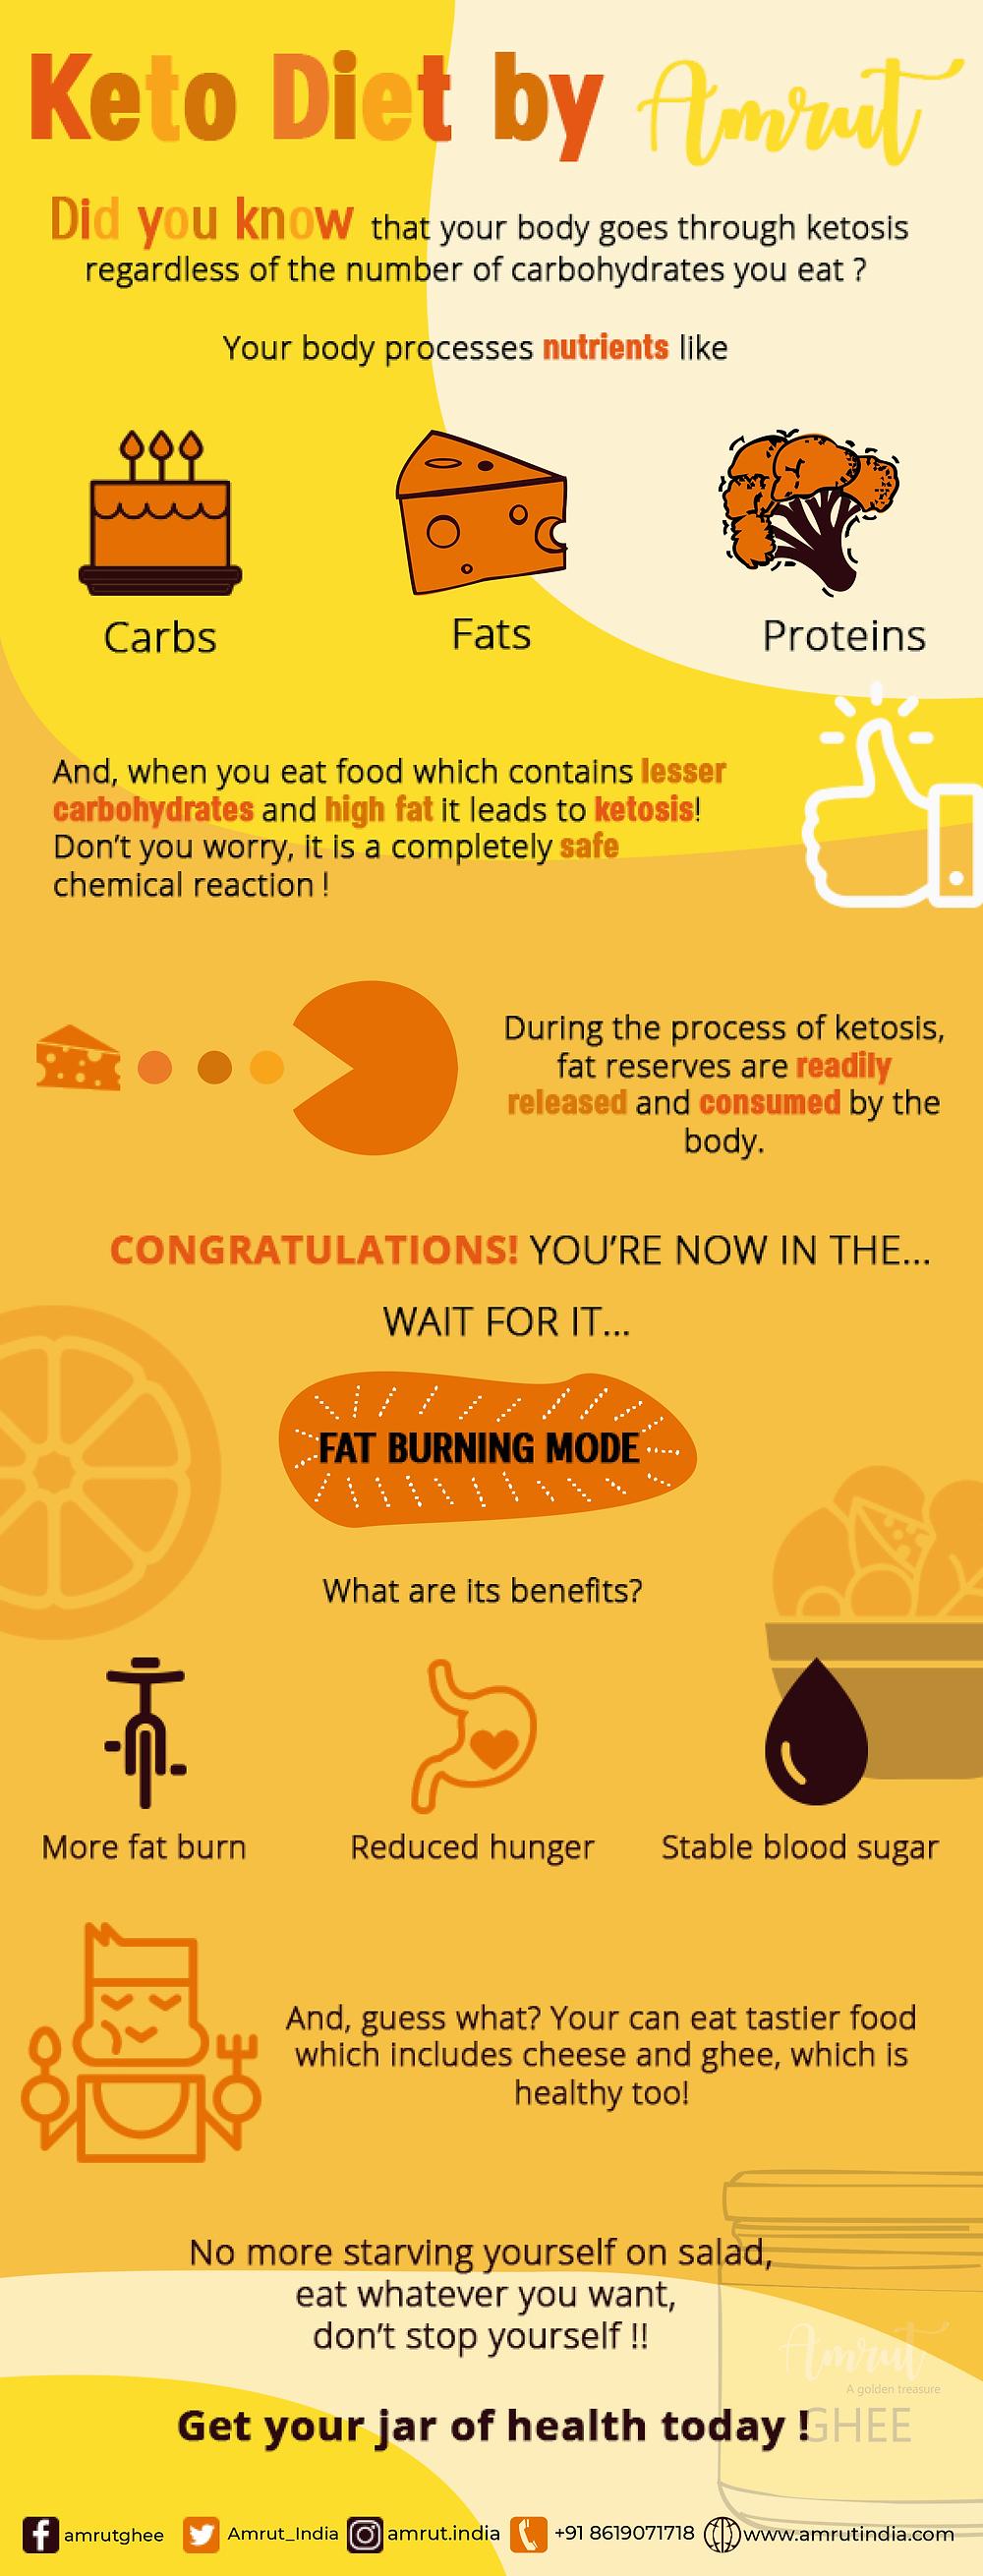 keto-diet-by-amrut